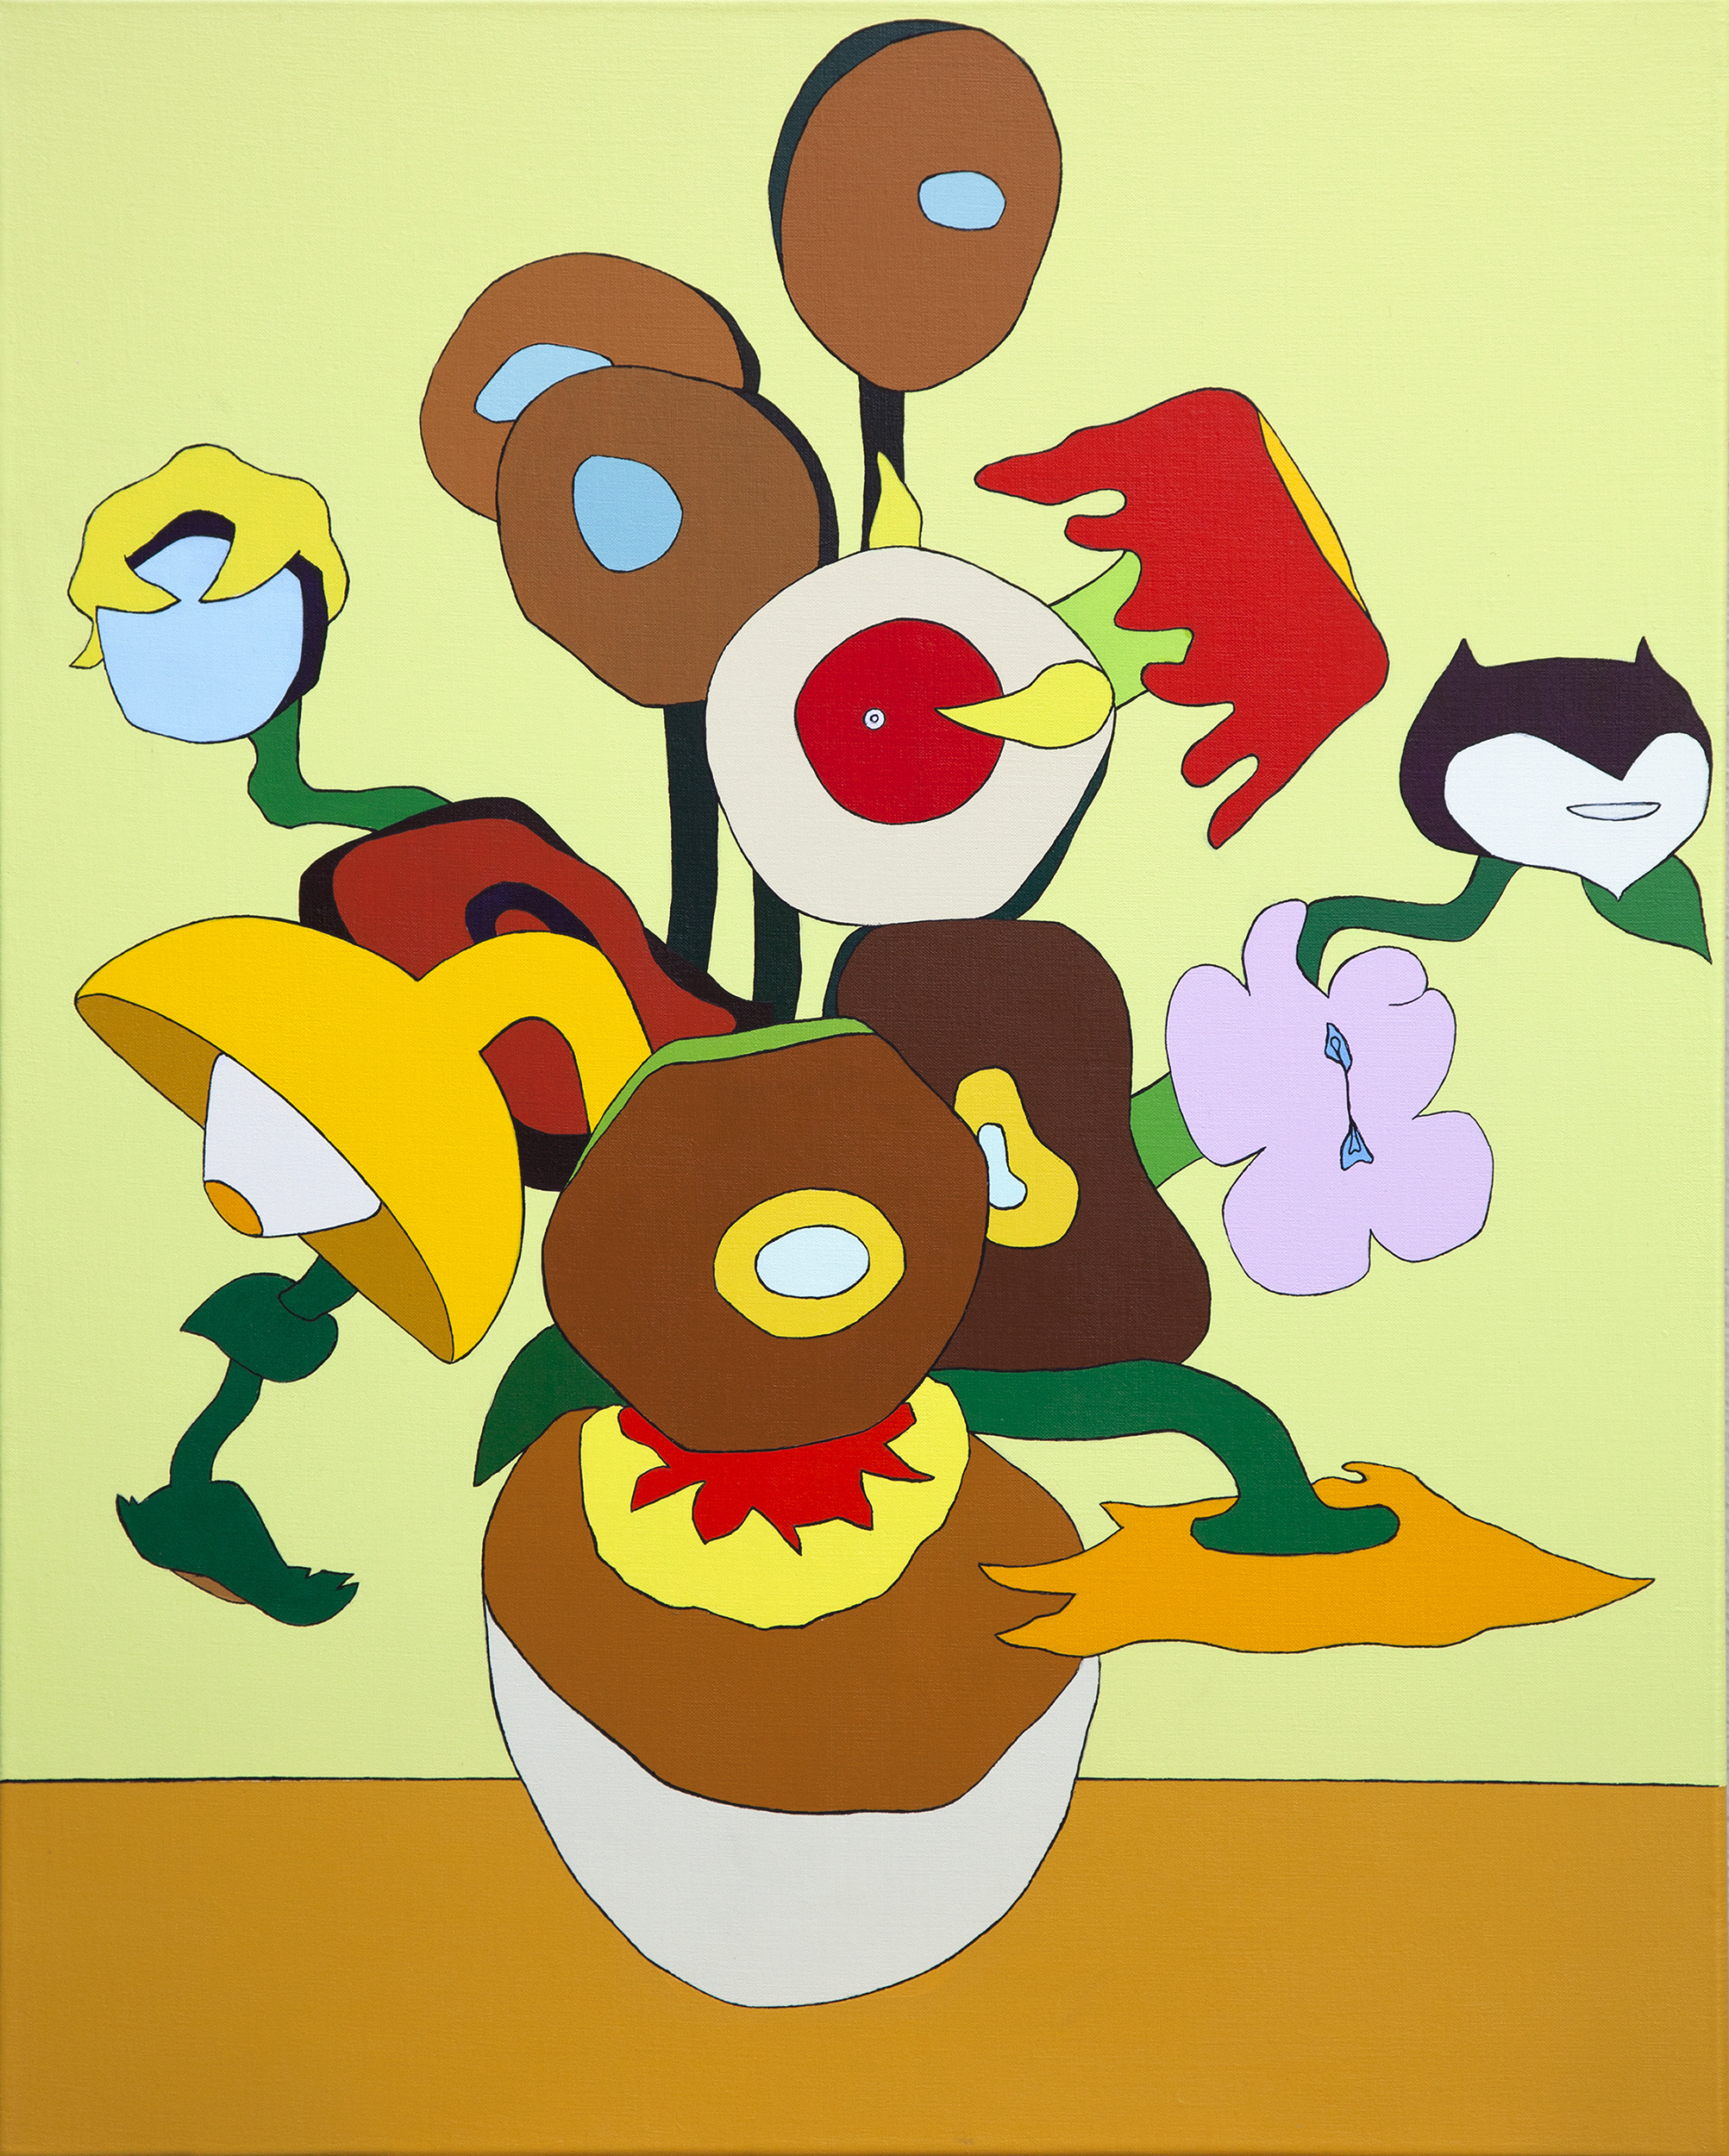 Twelve Sunflowers in a Vase IX, painting by Wouter van Riessen